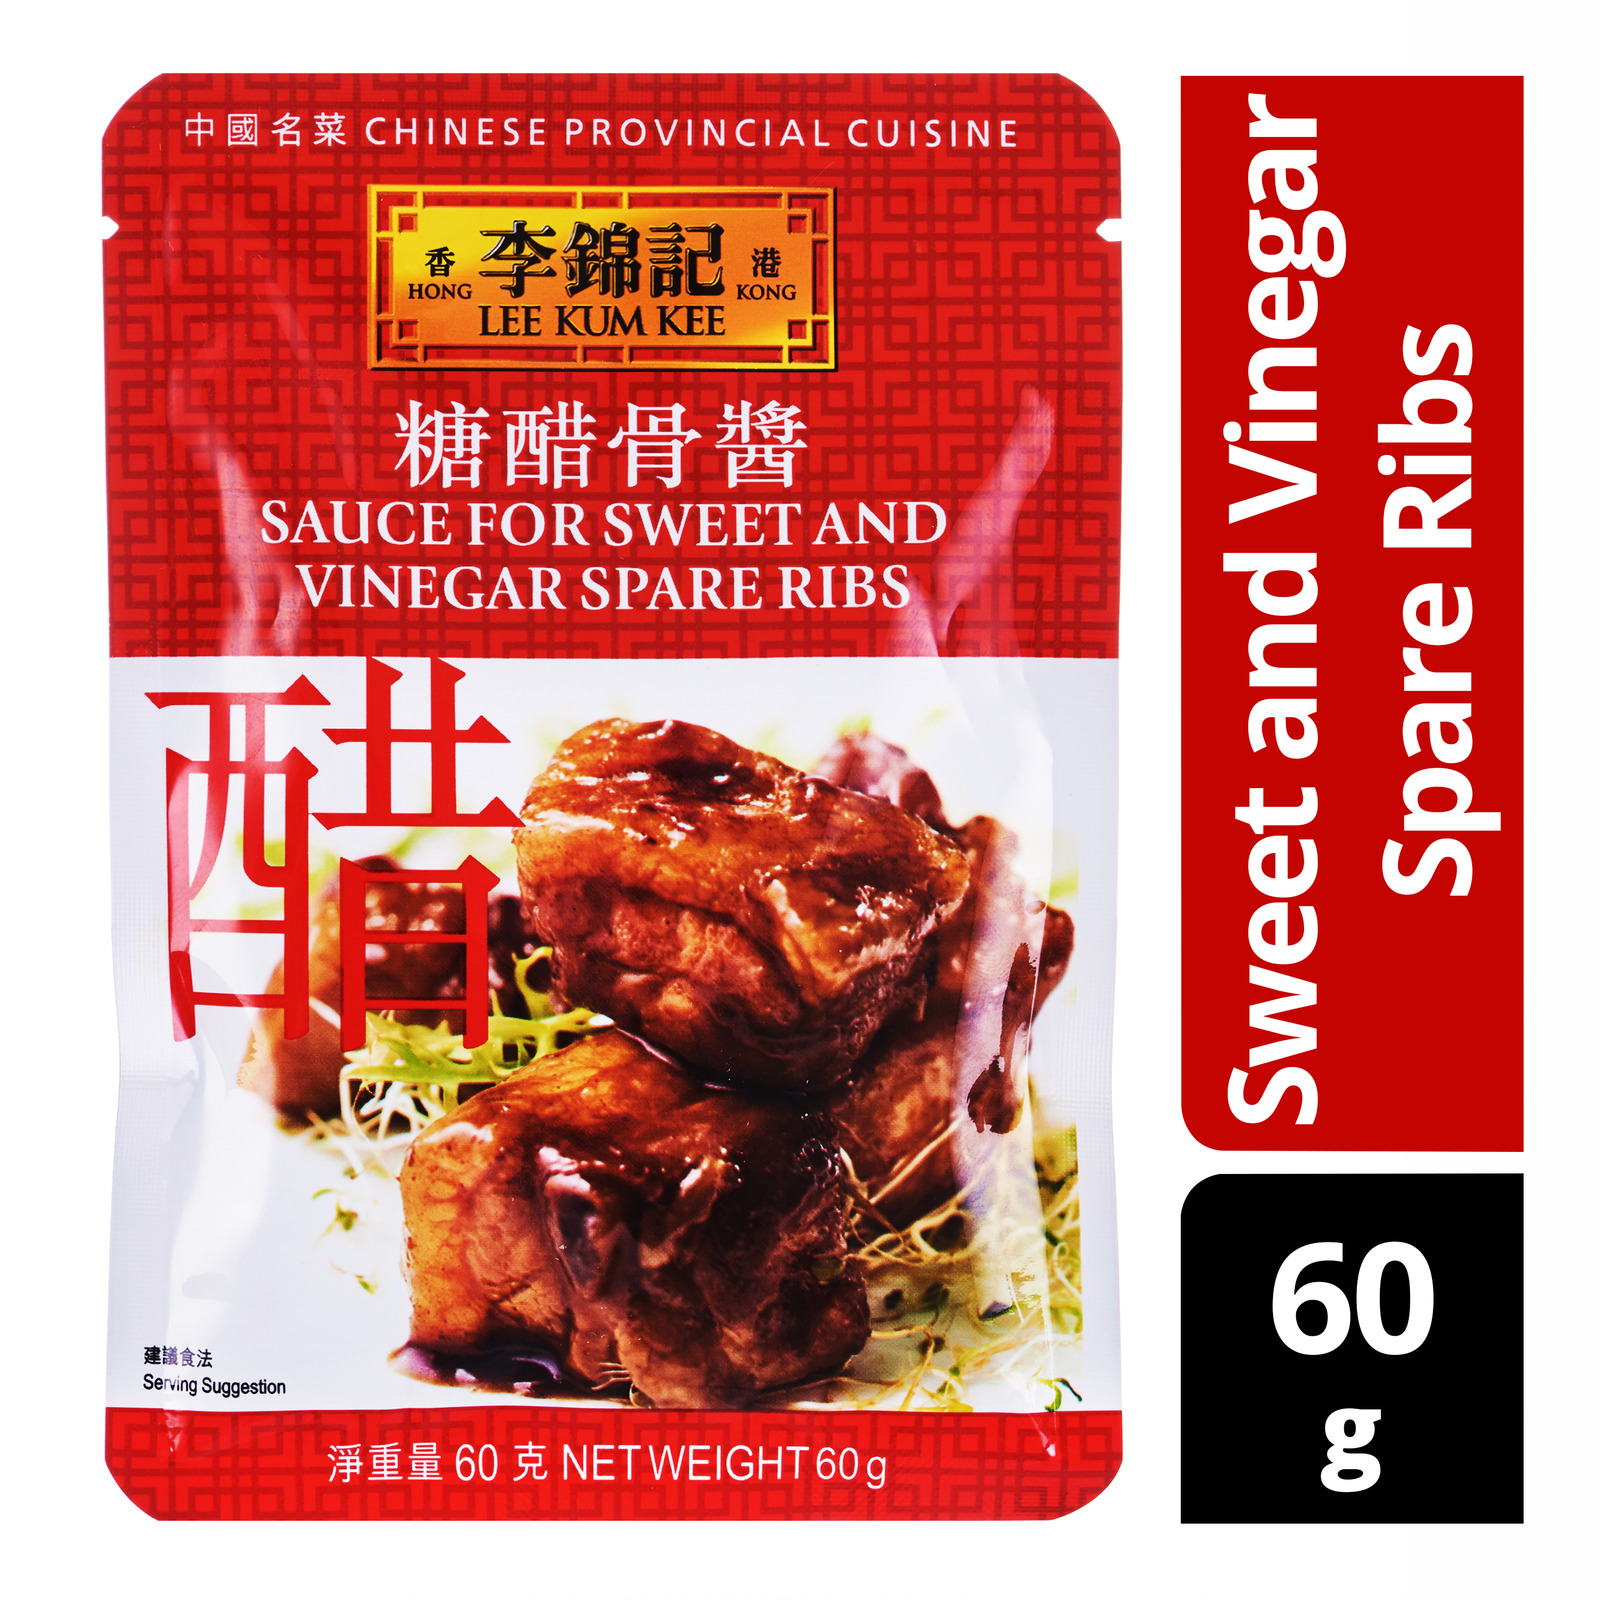 Lee Kum Kee Sauce - Sweet and Vinegar Spare Ribs